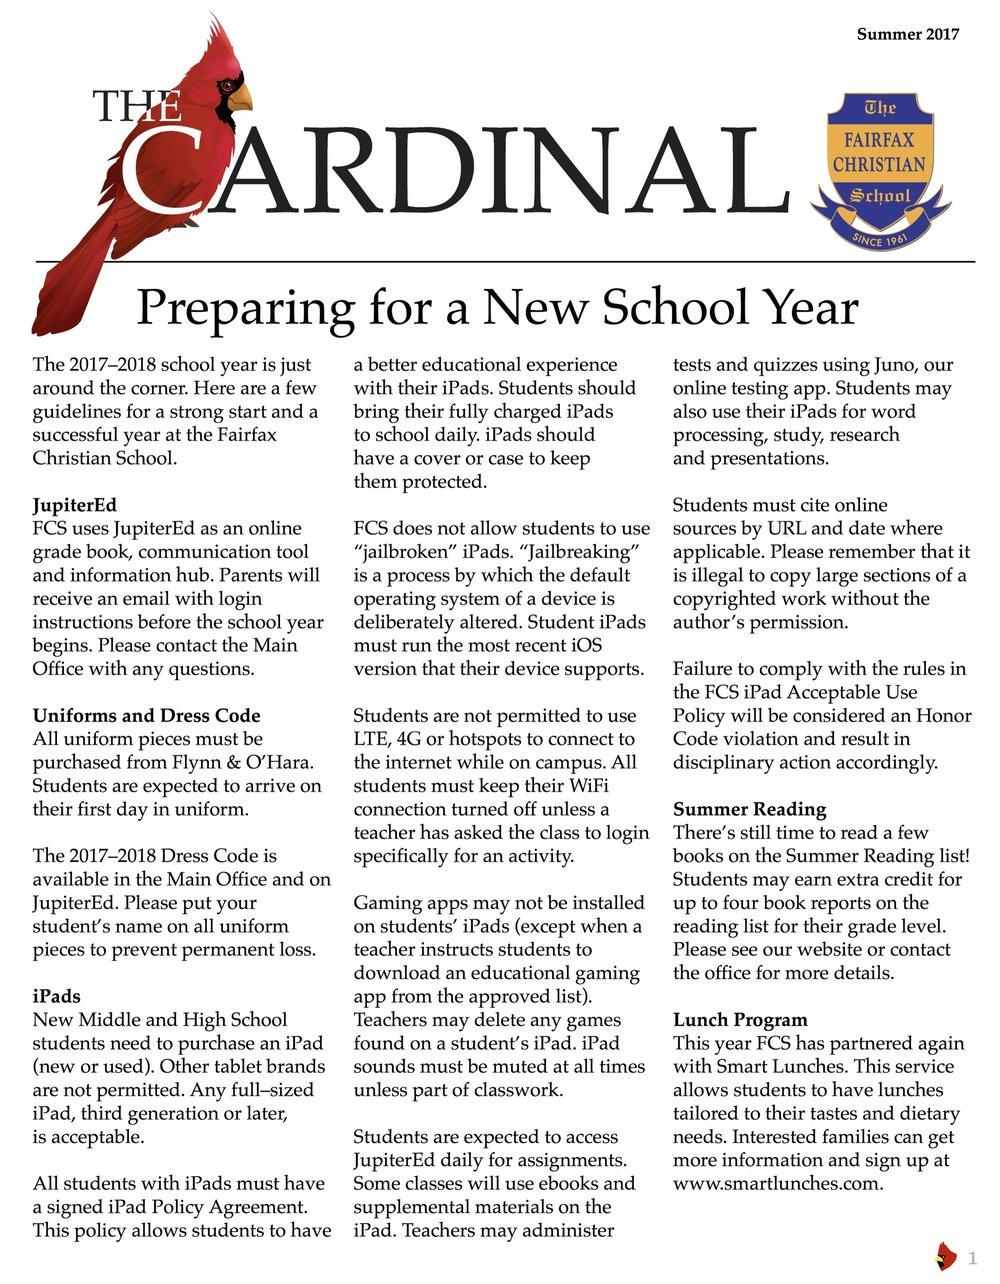 The Cardinal Summer 2017